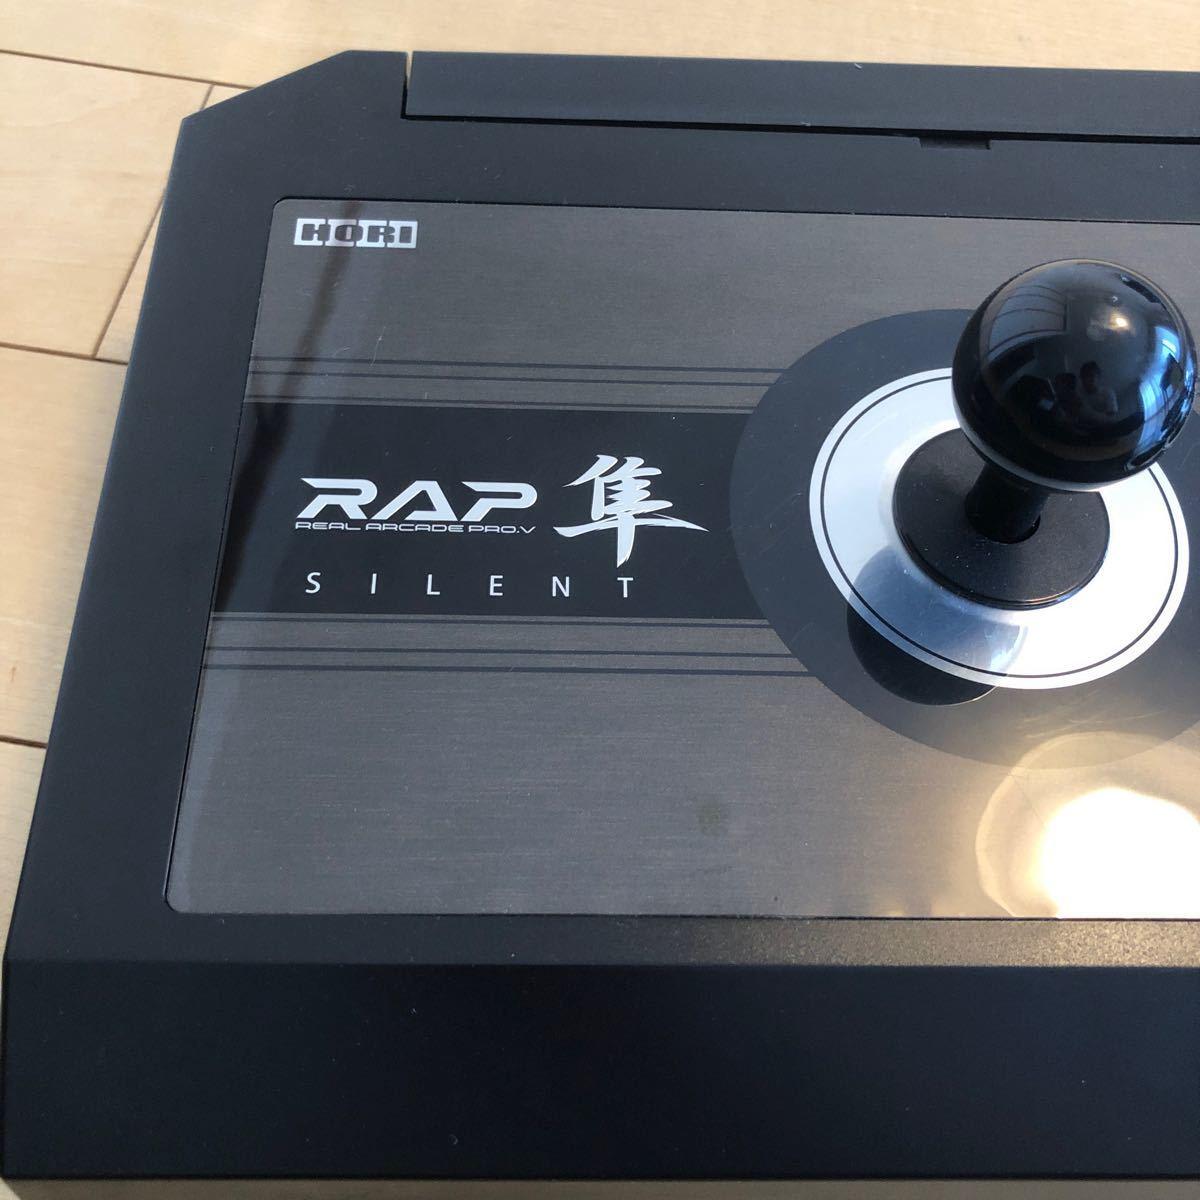 【PS4/PS3対応】リアルアーケードPro.Vサイレント隼 (静音) 美品